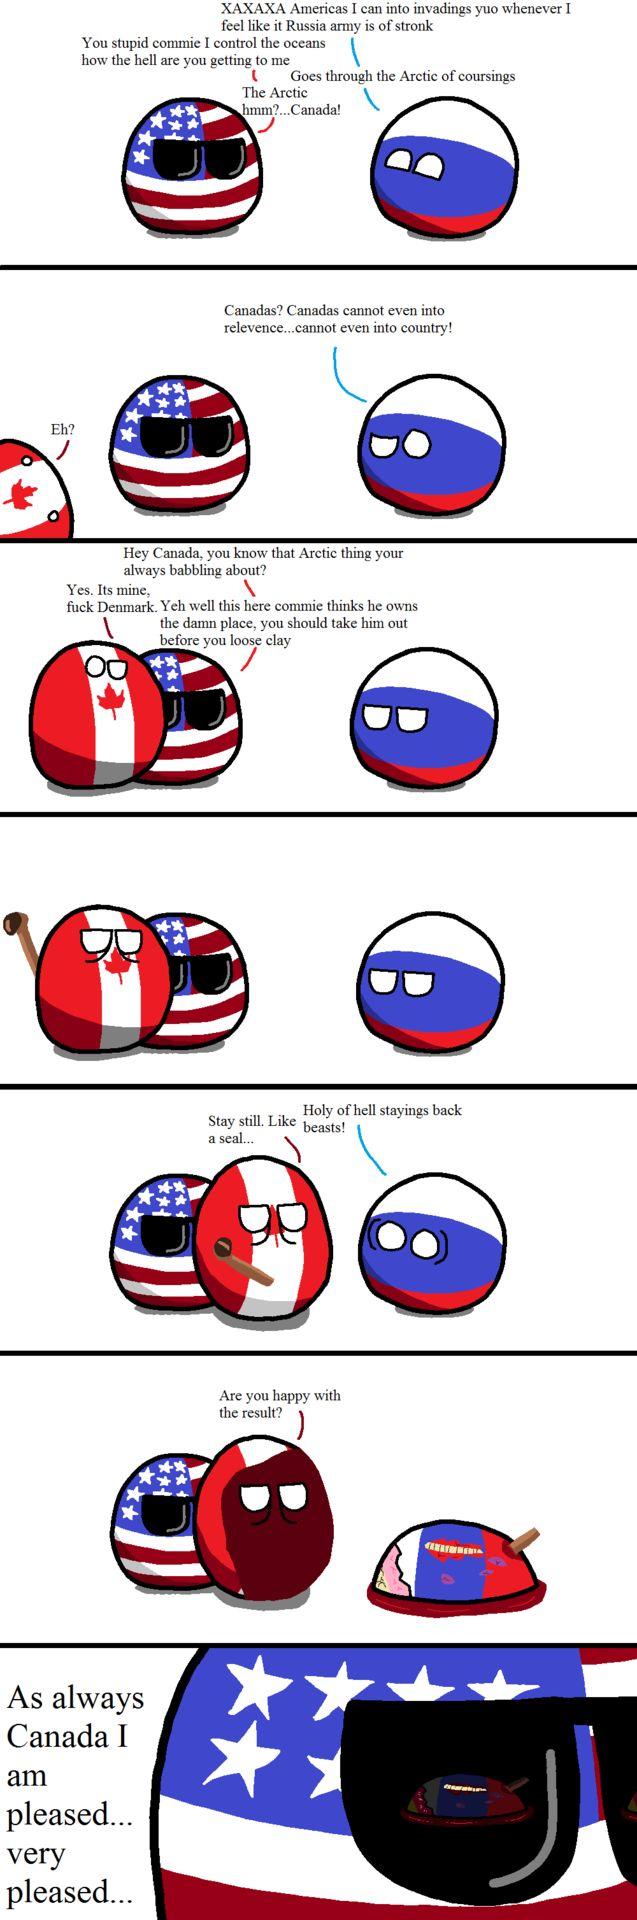 Canada is secretly psychotic